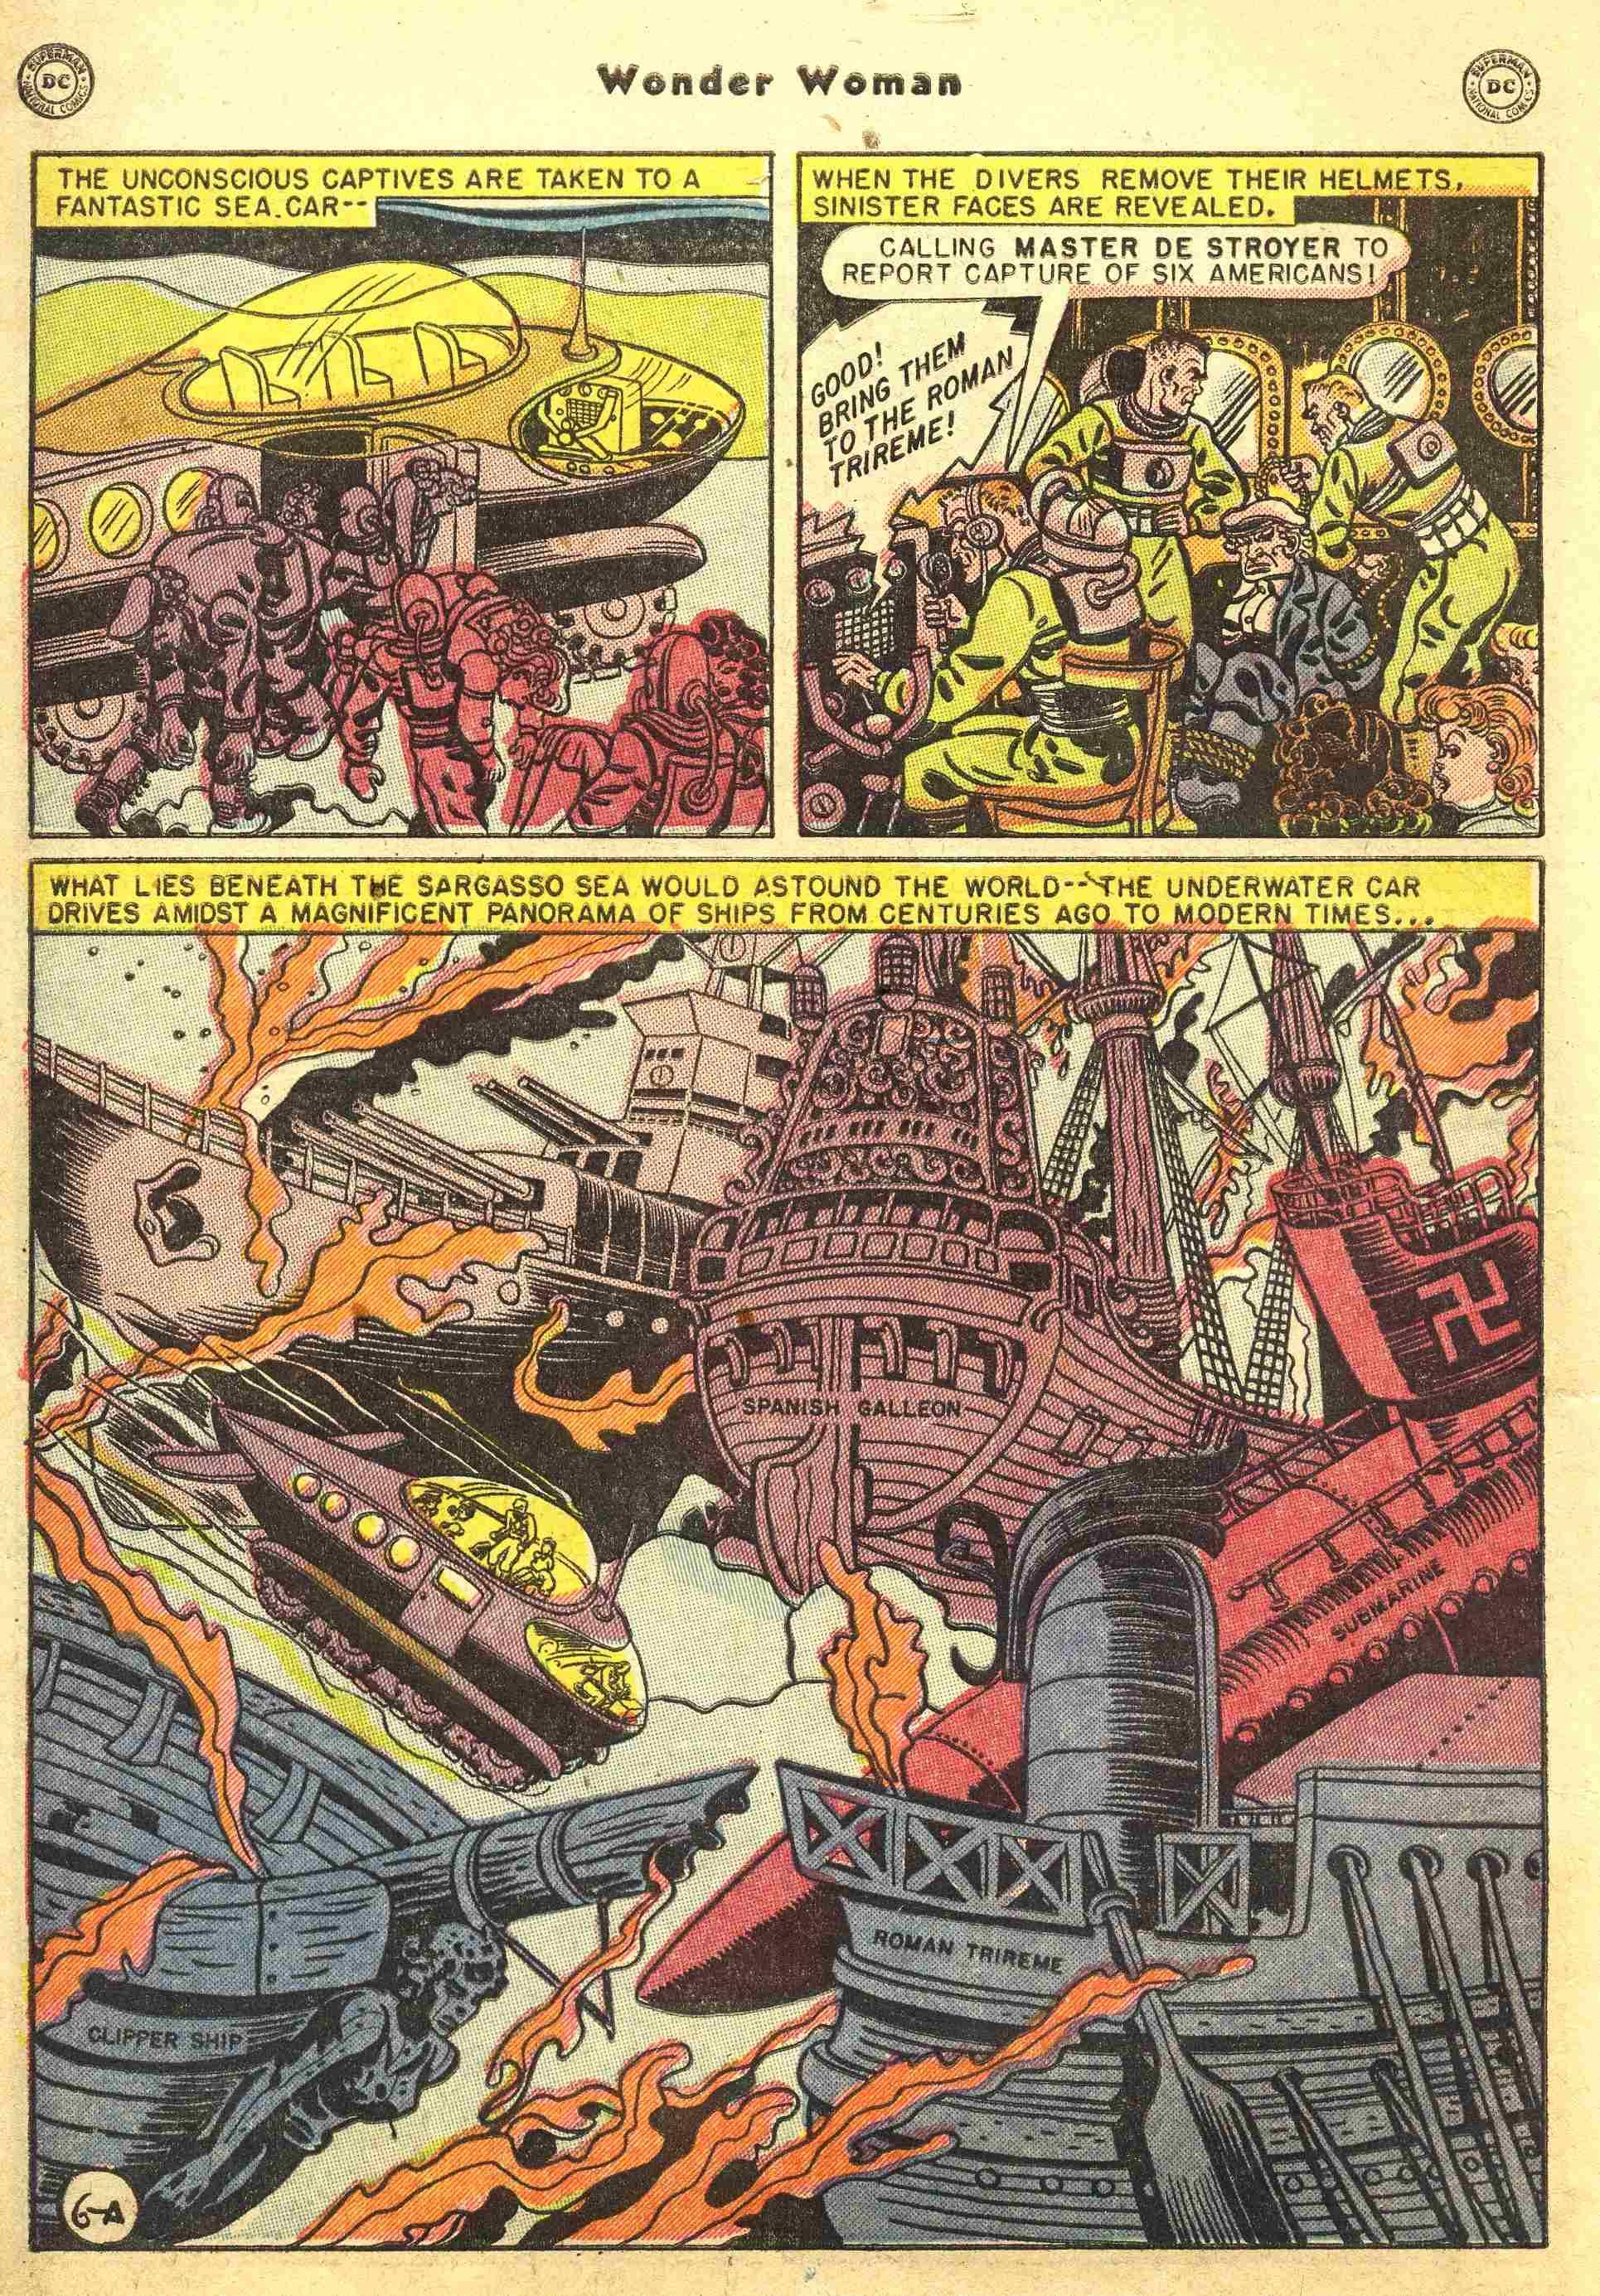 Read online Wonder Woman (1942) comic -  Issue #44 - 7